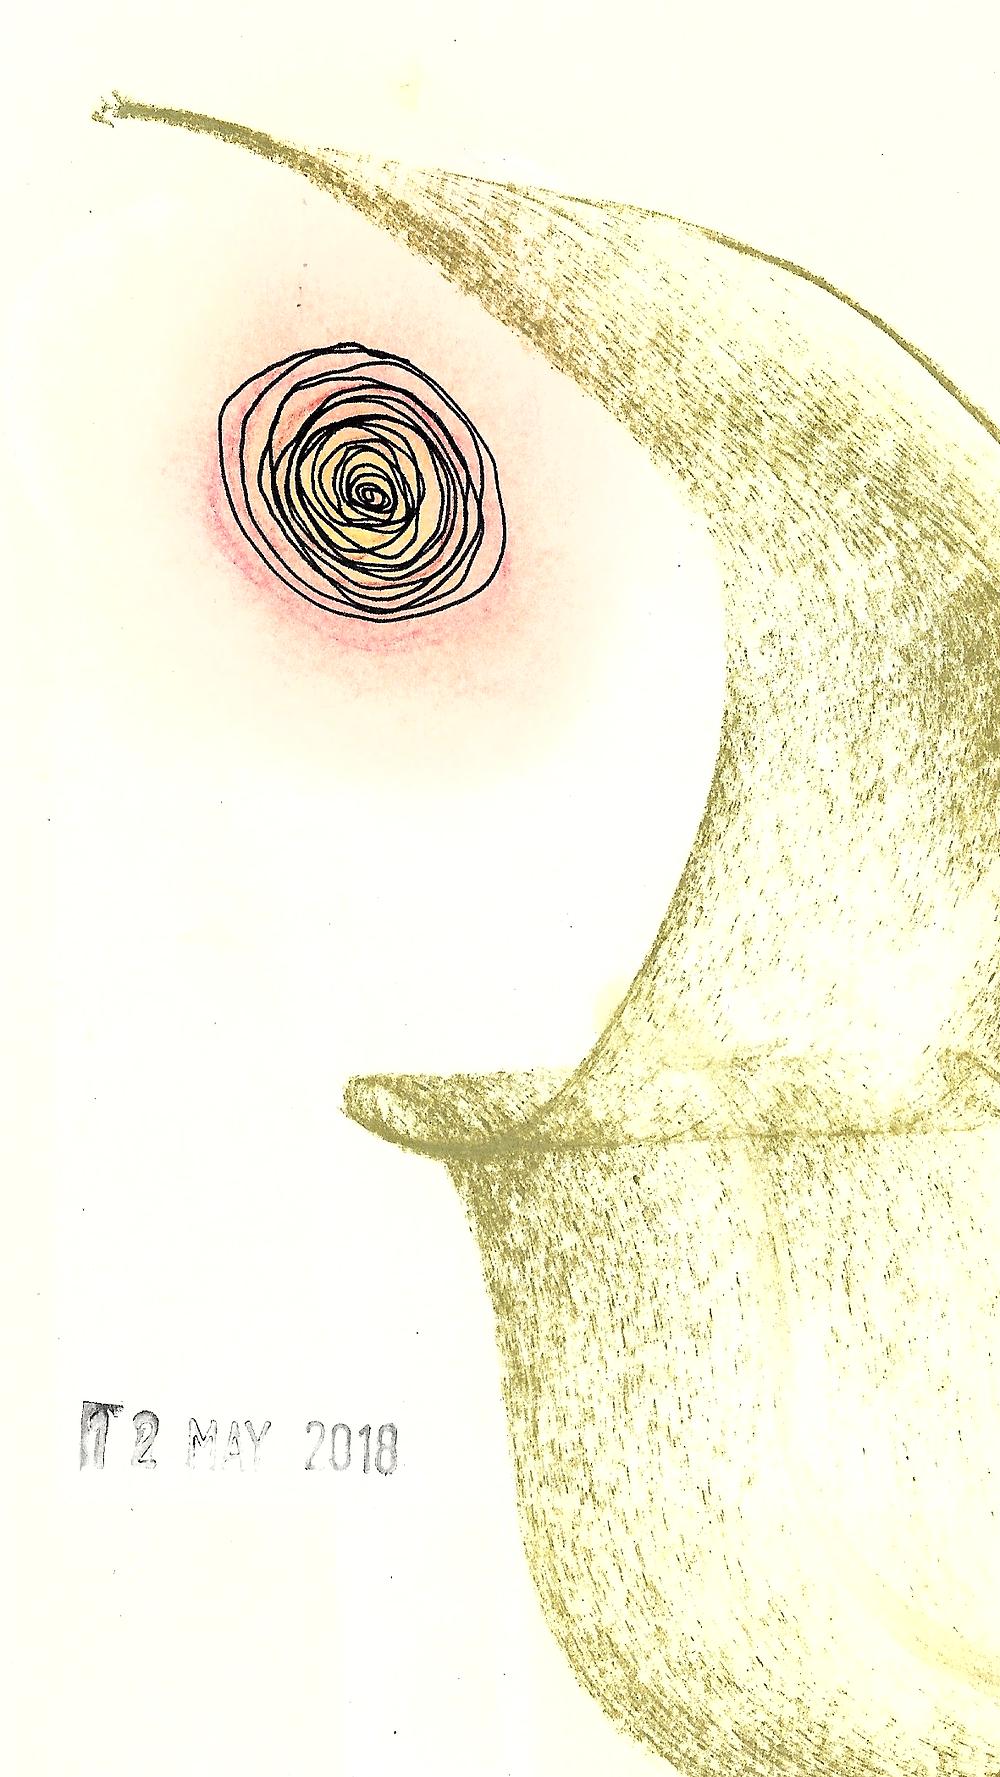 """Spiral"" | Carlos Herrera | Mixed media | 10.4 x 18.2 cms | 2018"